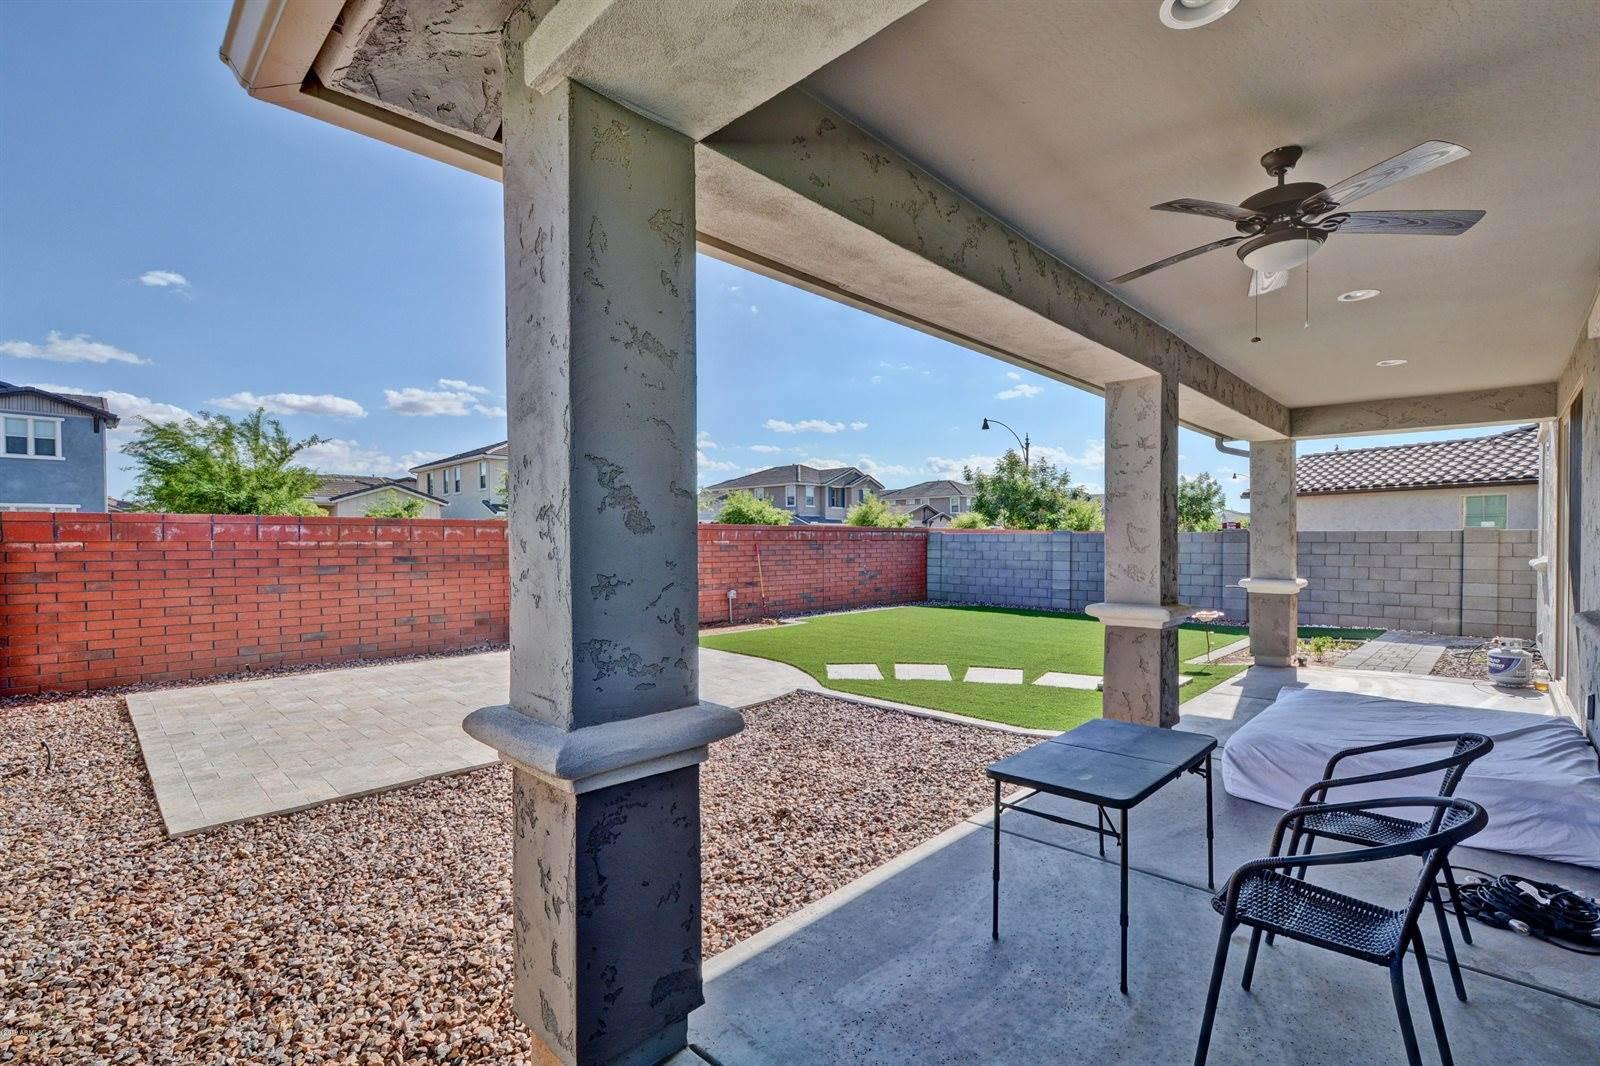 3847 East Welton Lane, Gilbert, AZ 85295